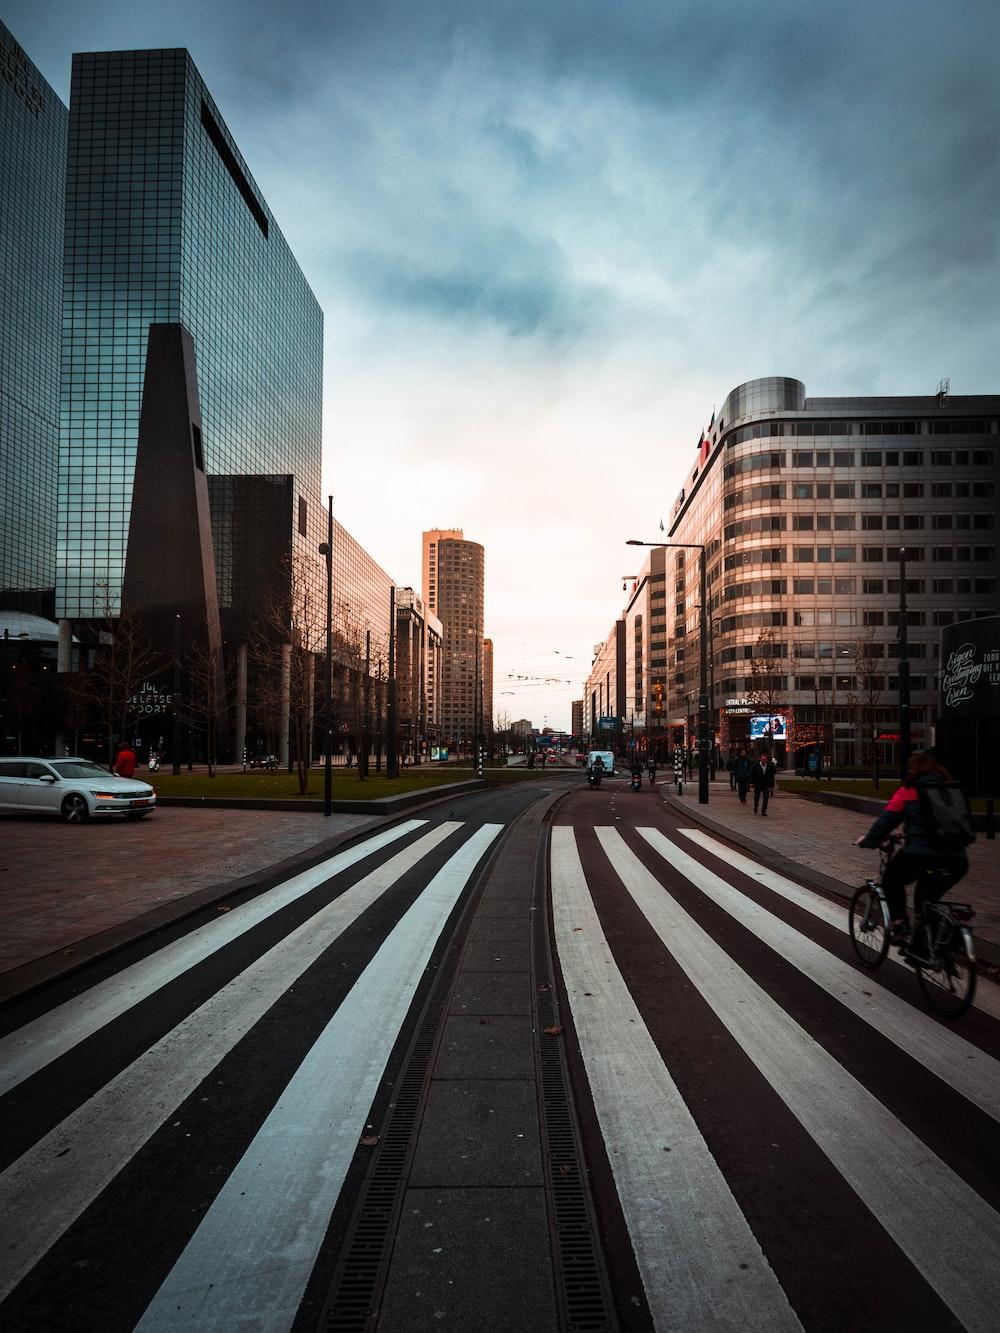 people biking and walking on road near buildings during daytime